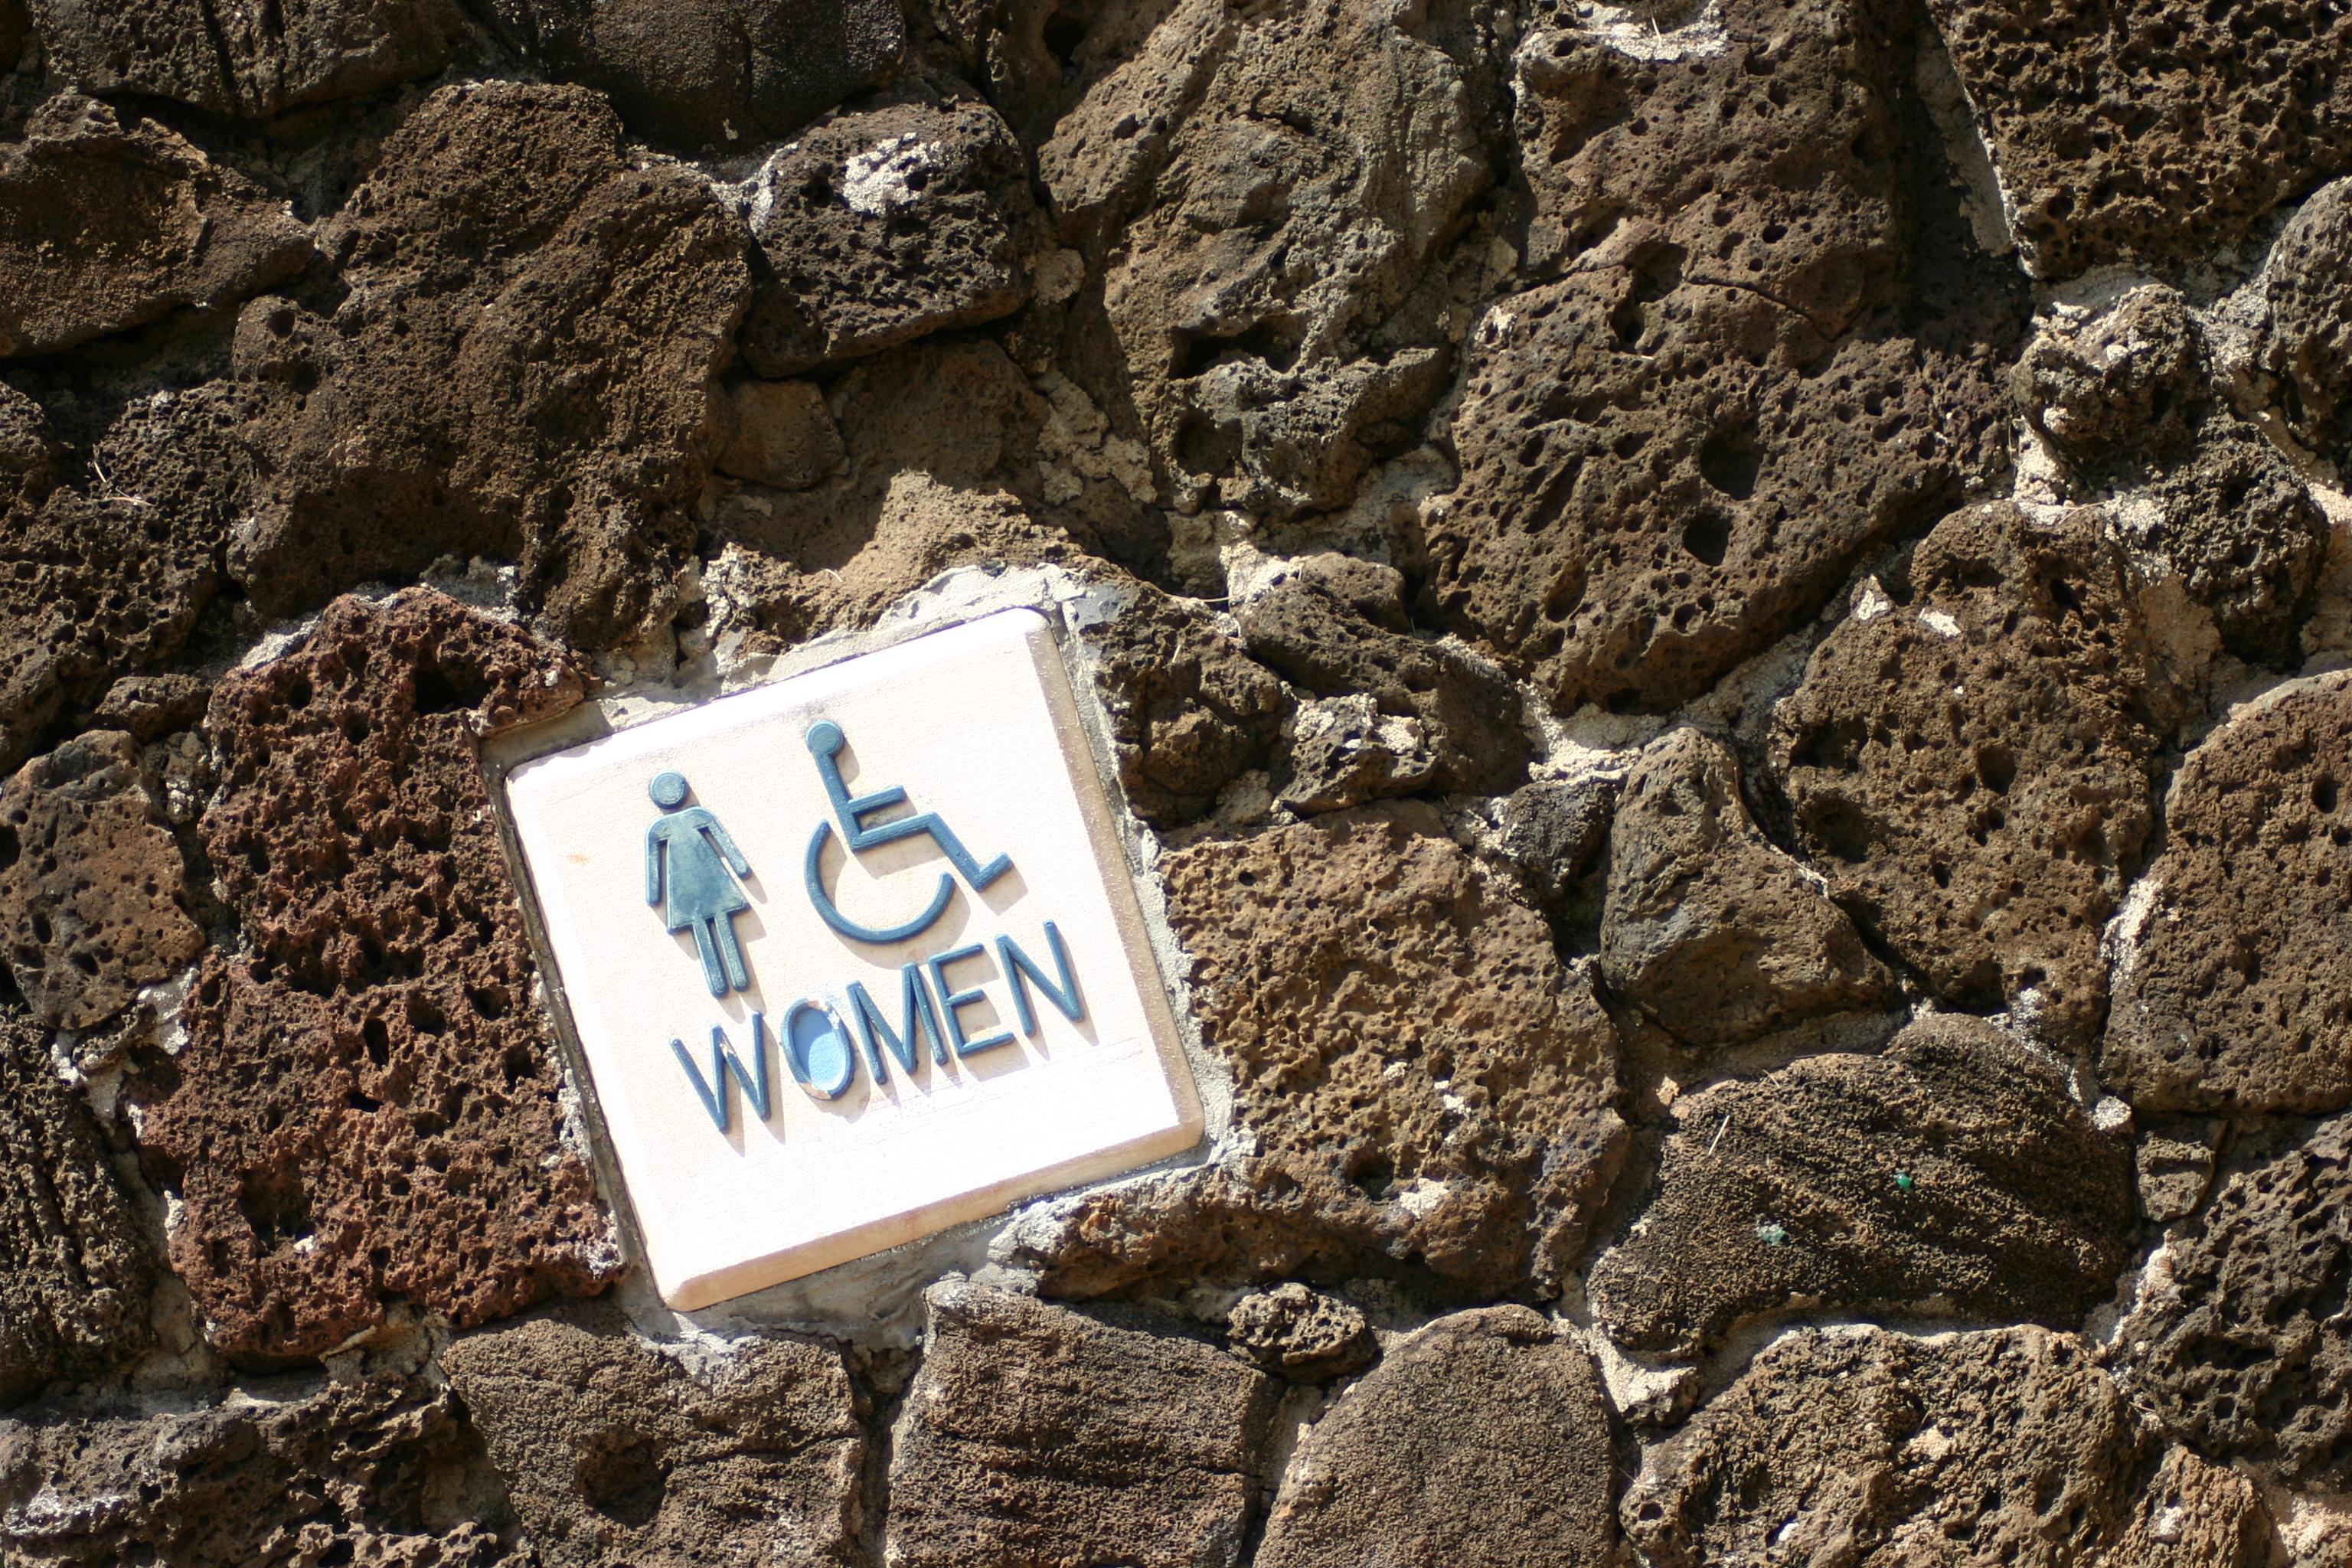 Bathroom Signs History file:beach bathroom signs - wikimedia commons